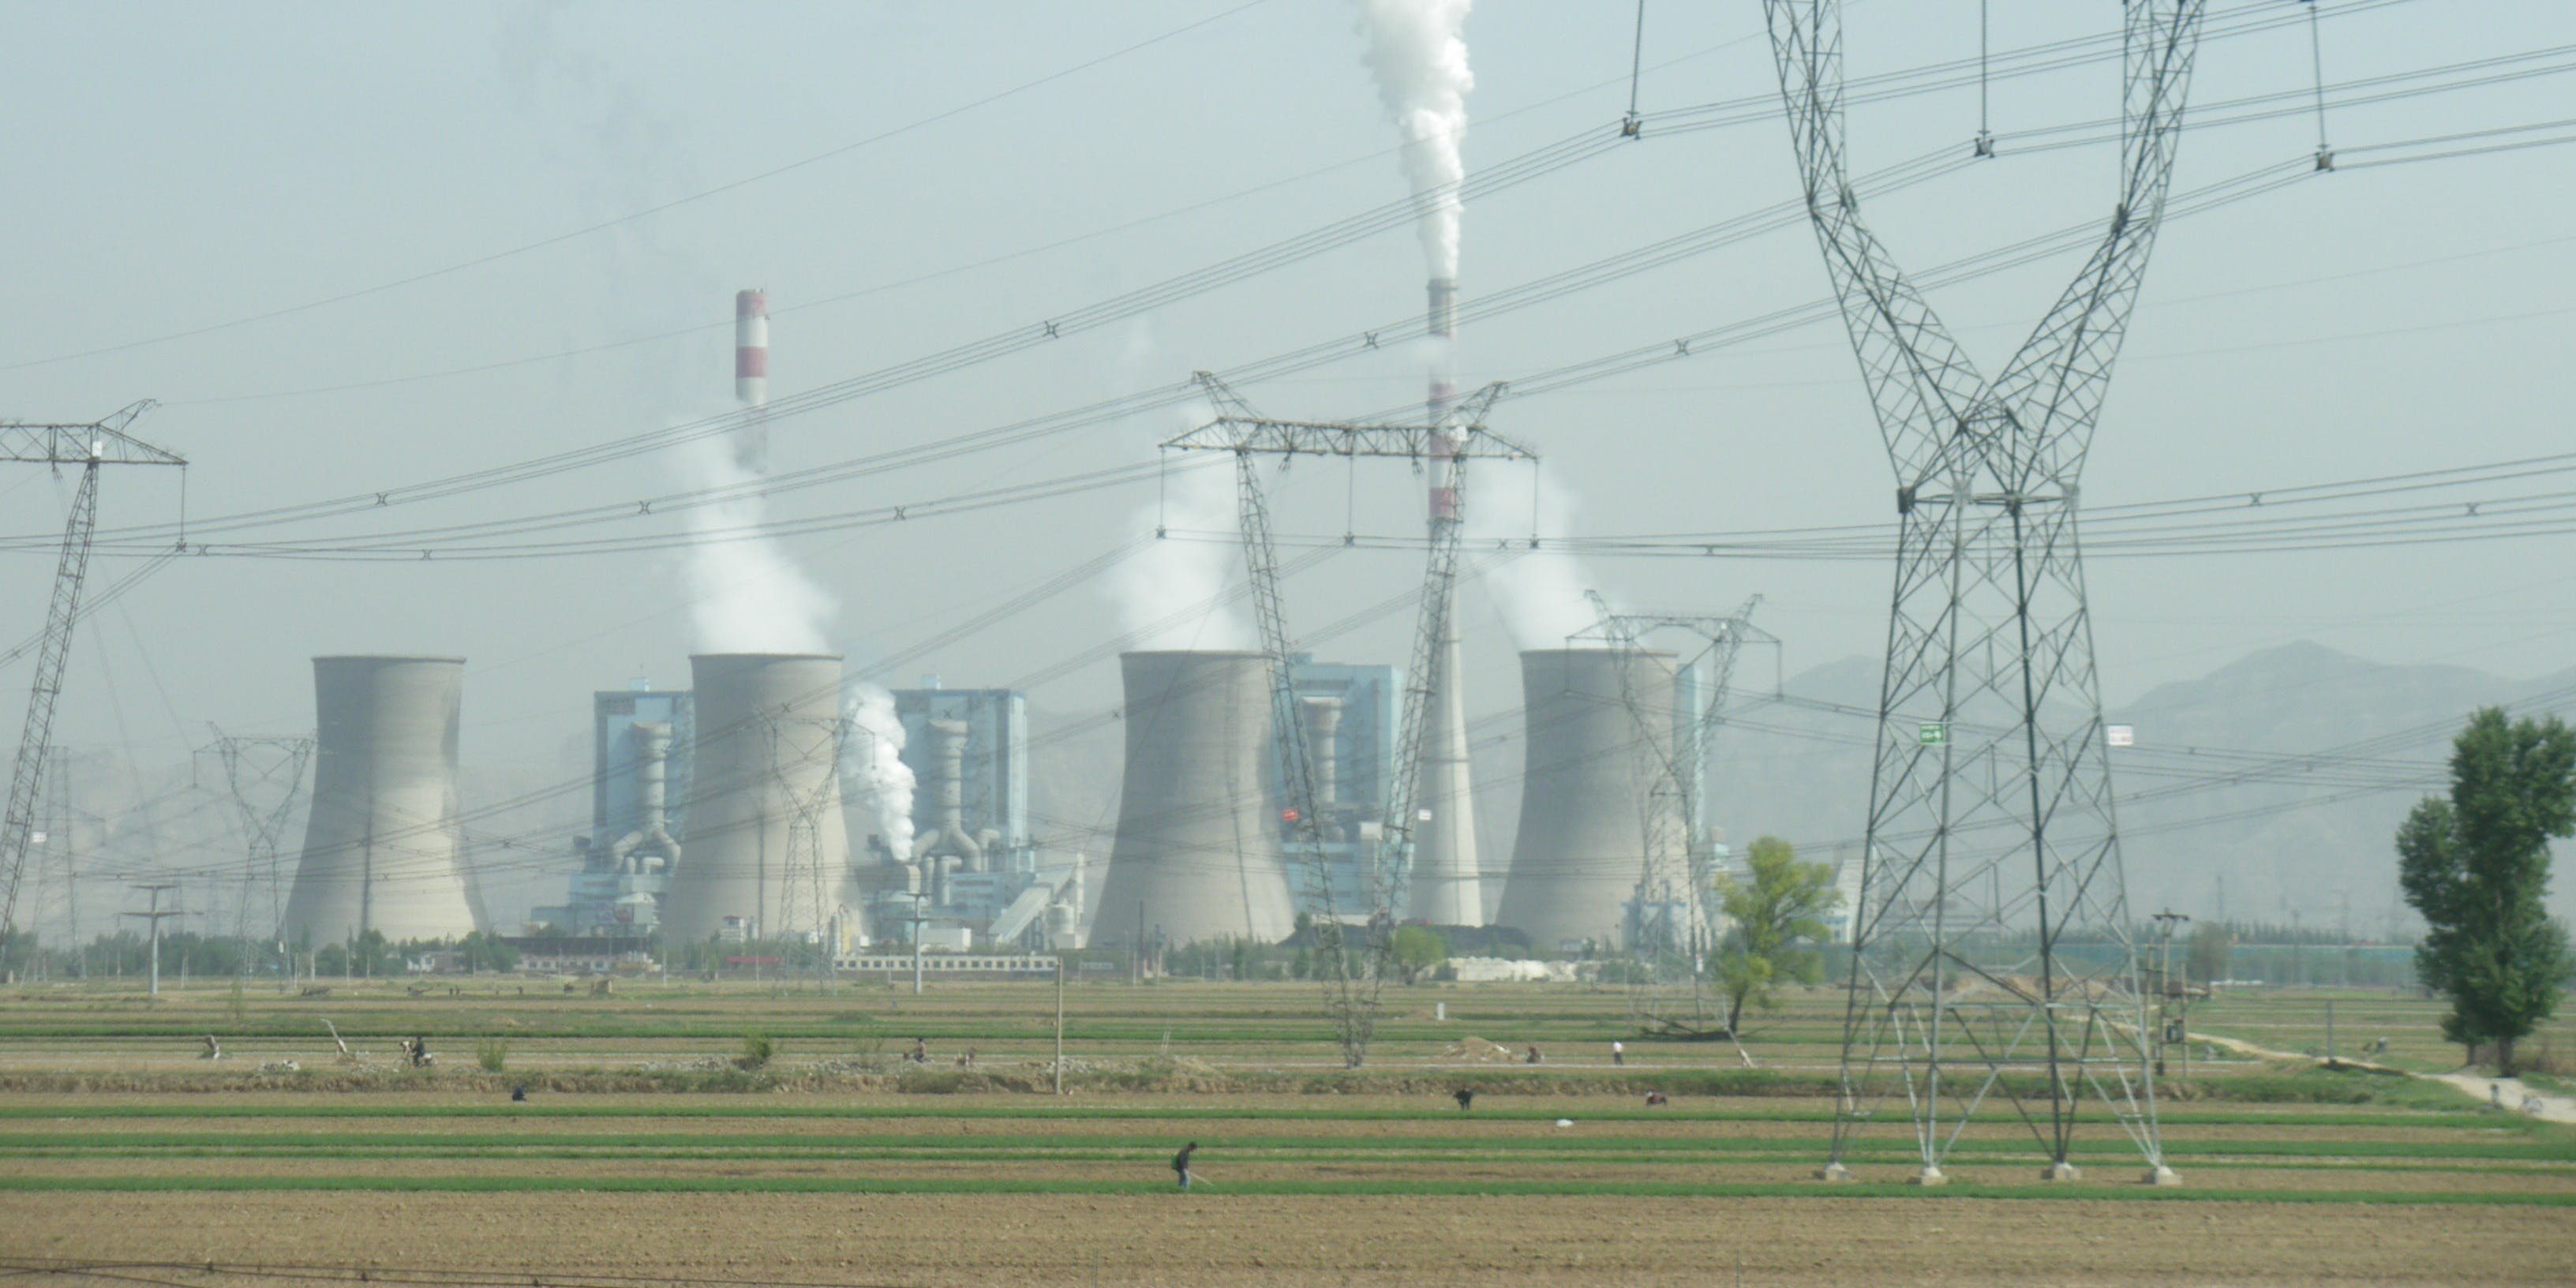 Photo of a coal-fired power plant in Shuozhou, Shanxi, China